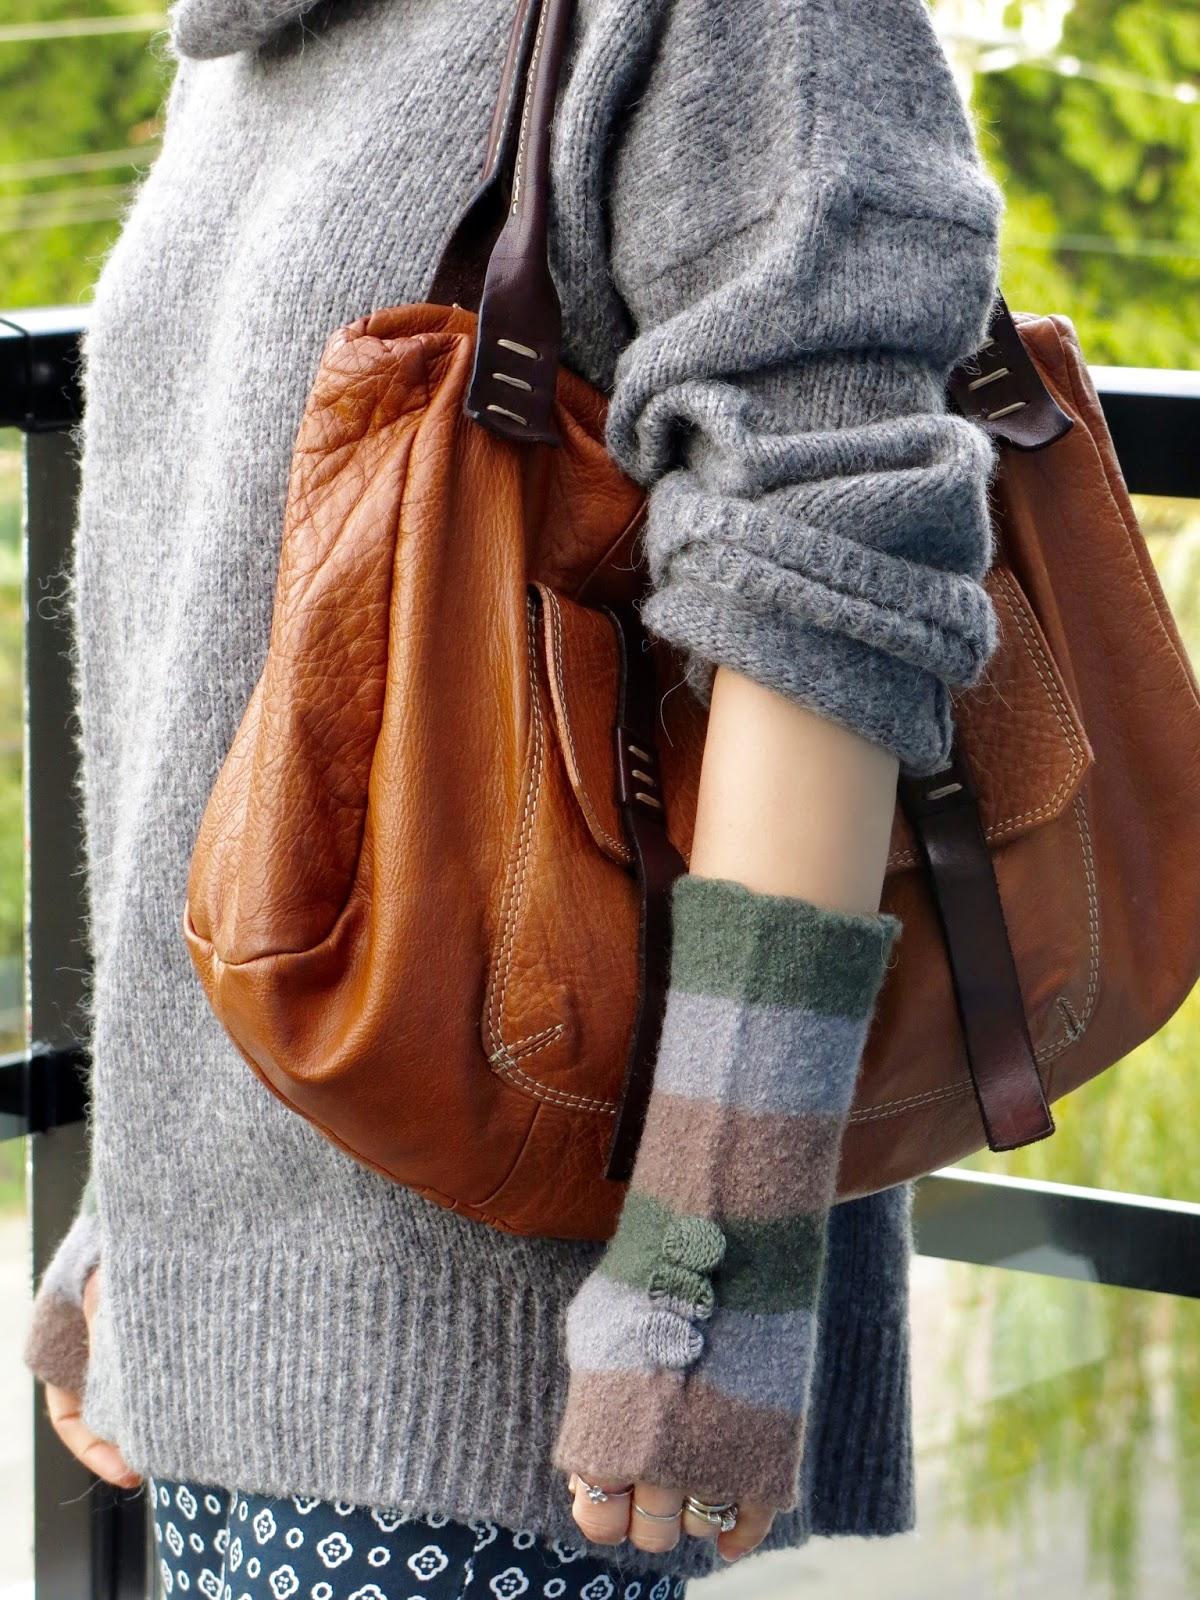 oversized turtleneck, fingerless gloves, and a cognac satchel